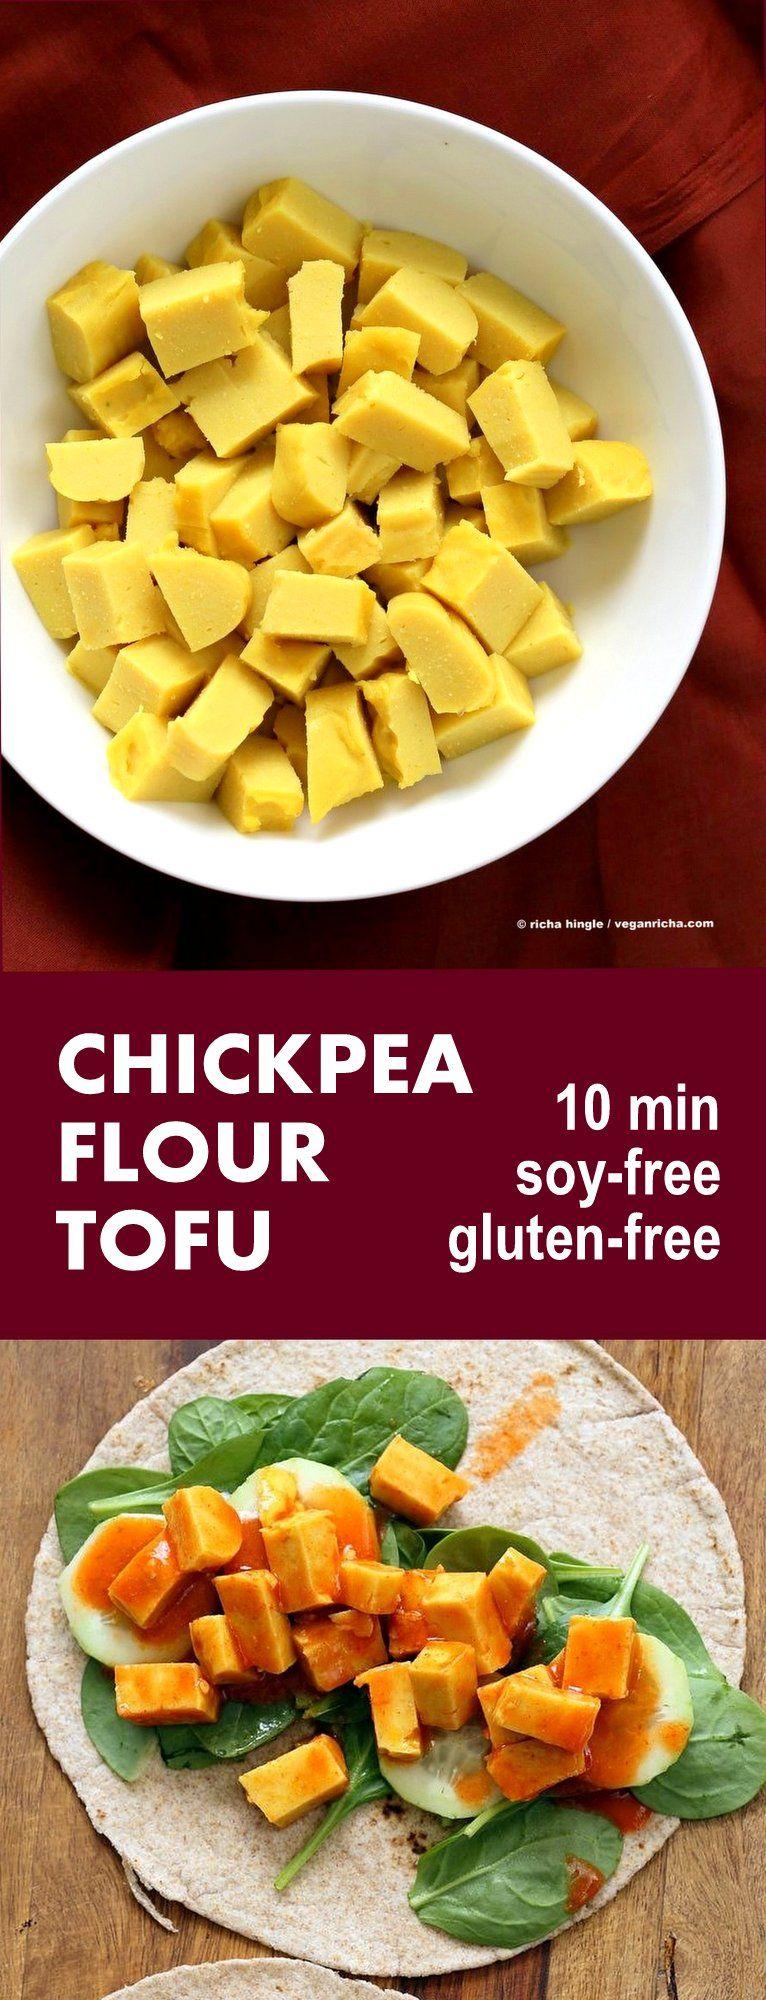 Chickpea Flour Tofu